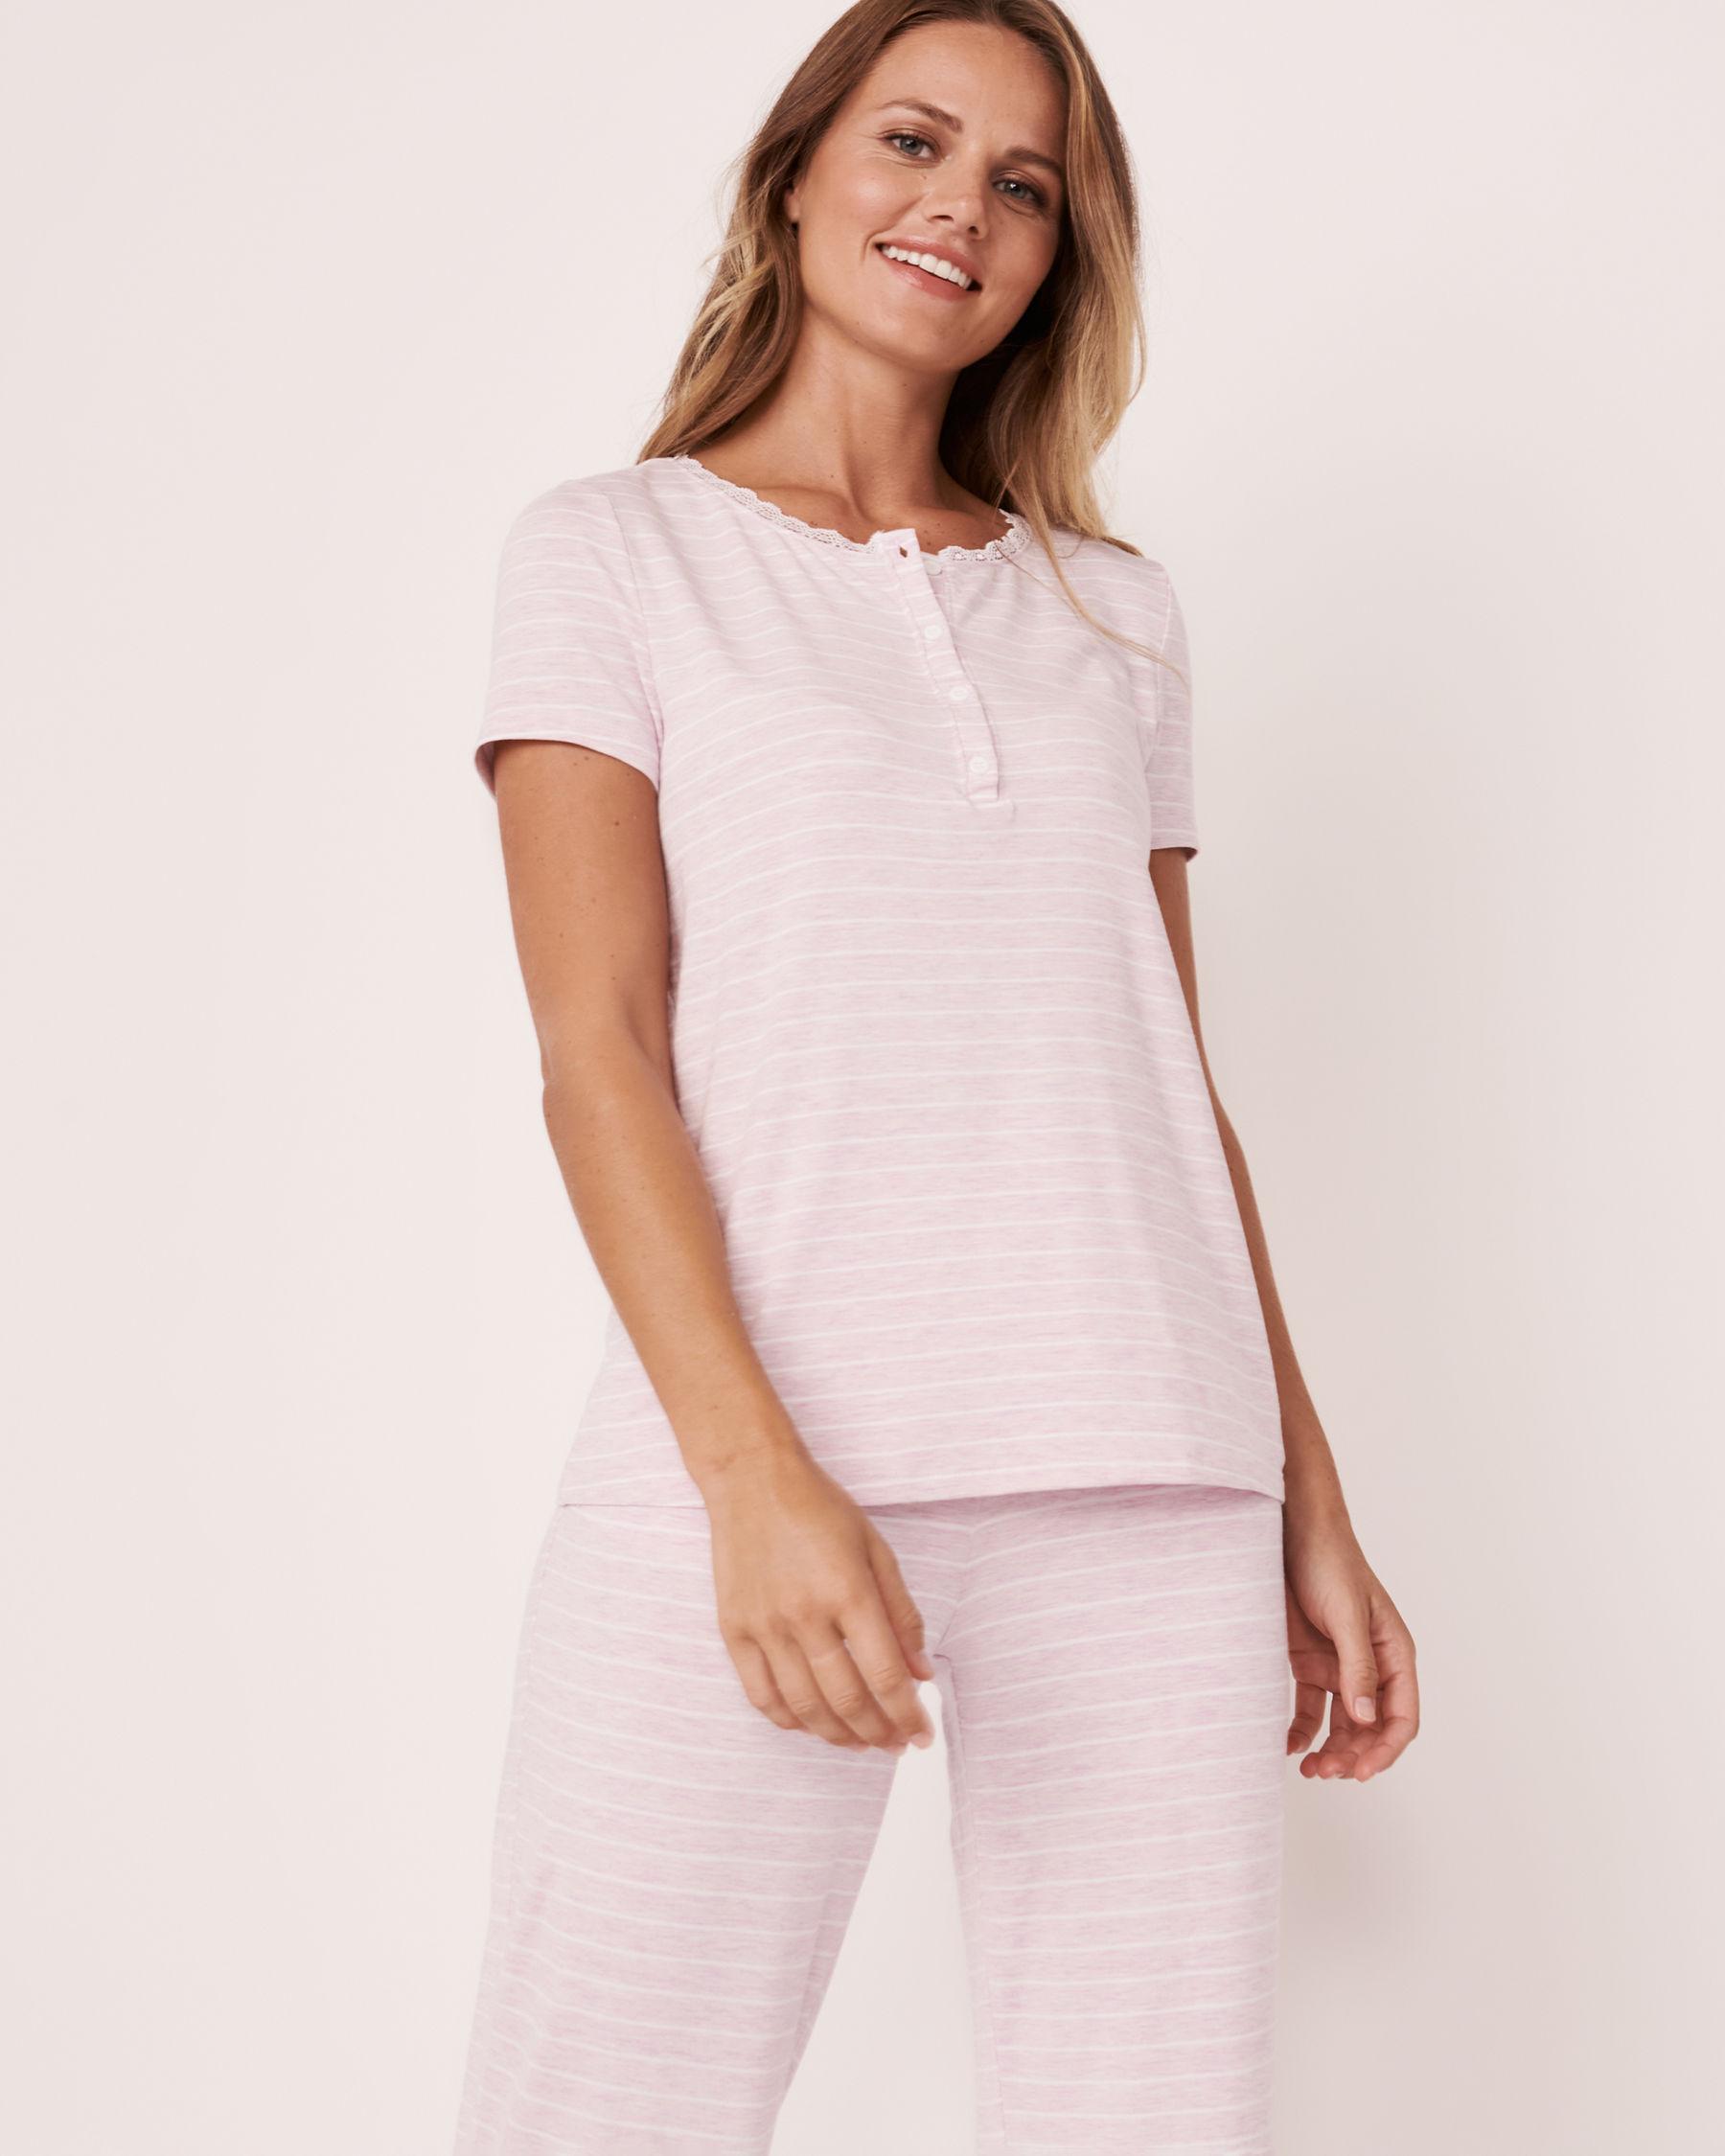 LA VIE EN ROSE Henley T-shirt Stripes 50100008 - View1